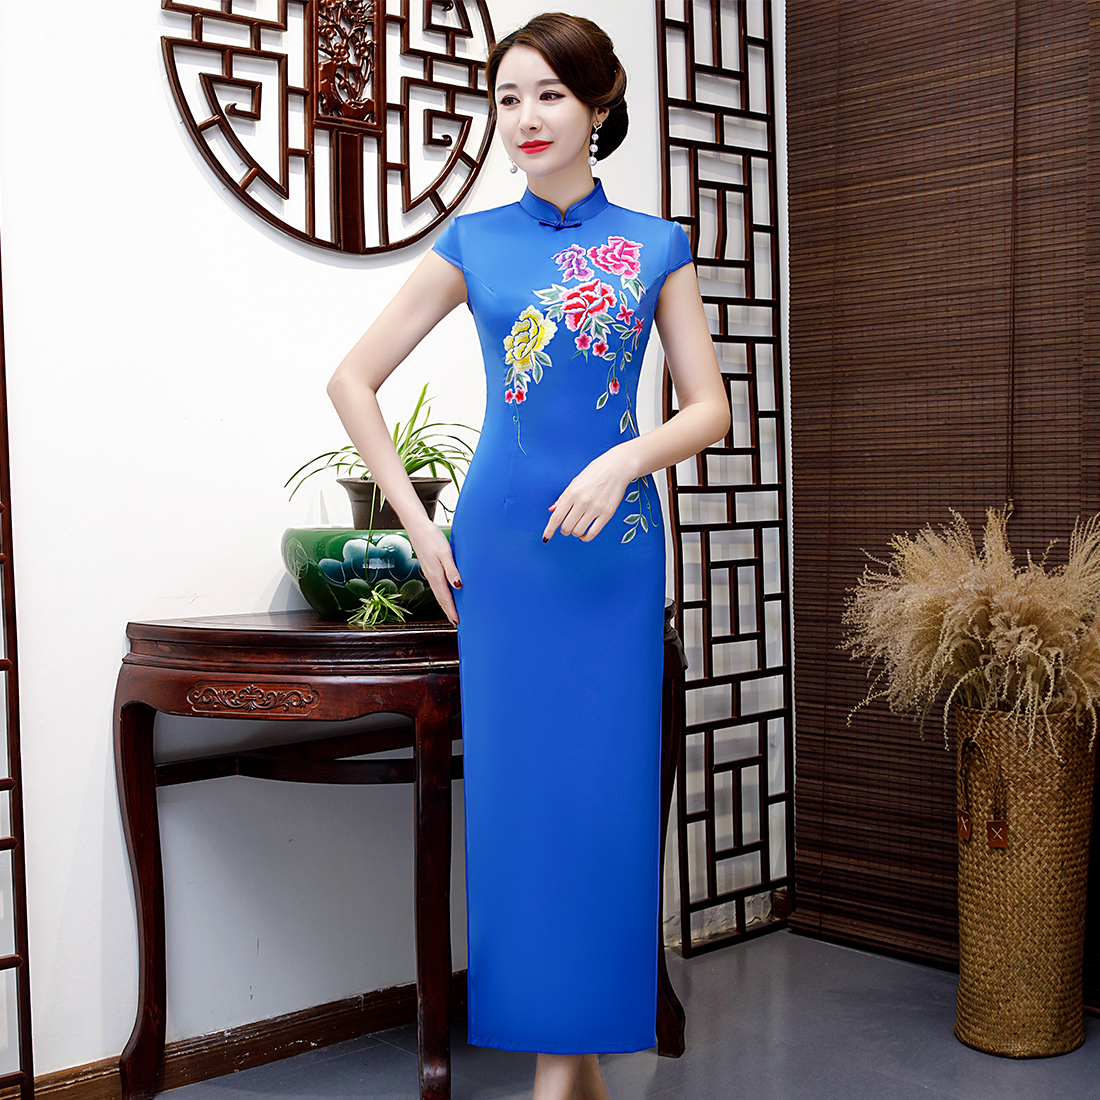 Bleu mandarine col femmes Satin Cheongsam chinois robe Sexy Slim serré grande taille 3XL 4XL Long imprimé fleur Vestidos Qipao